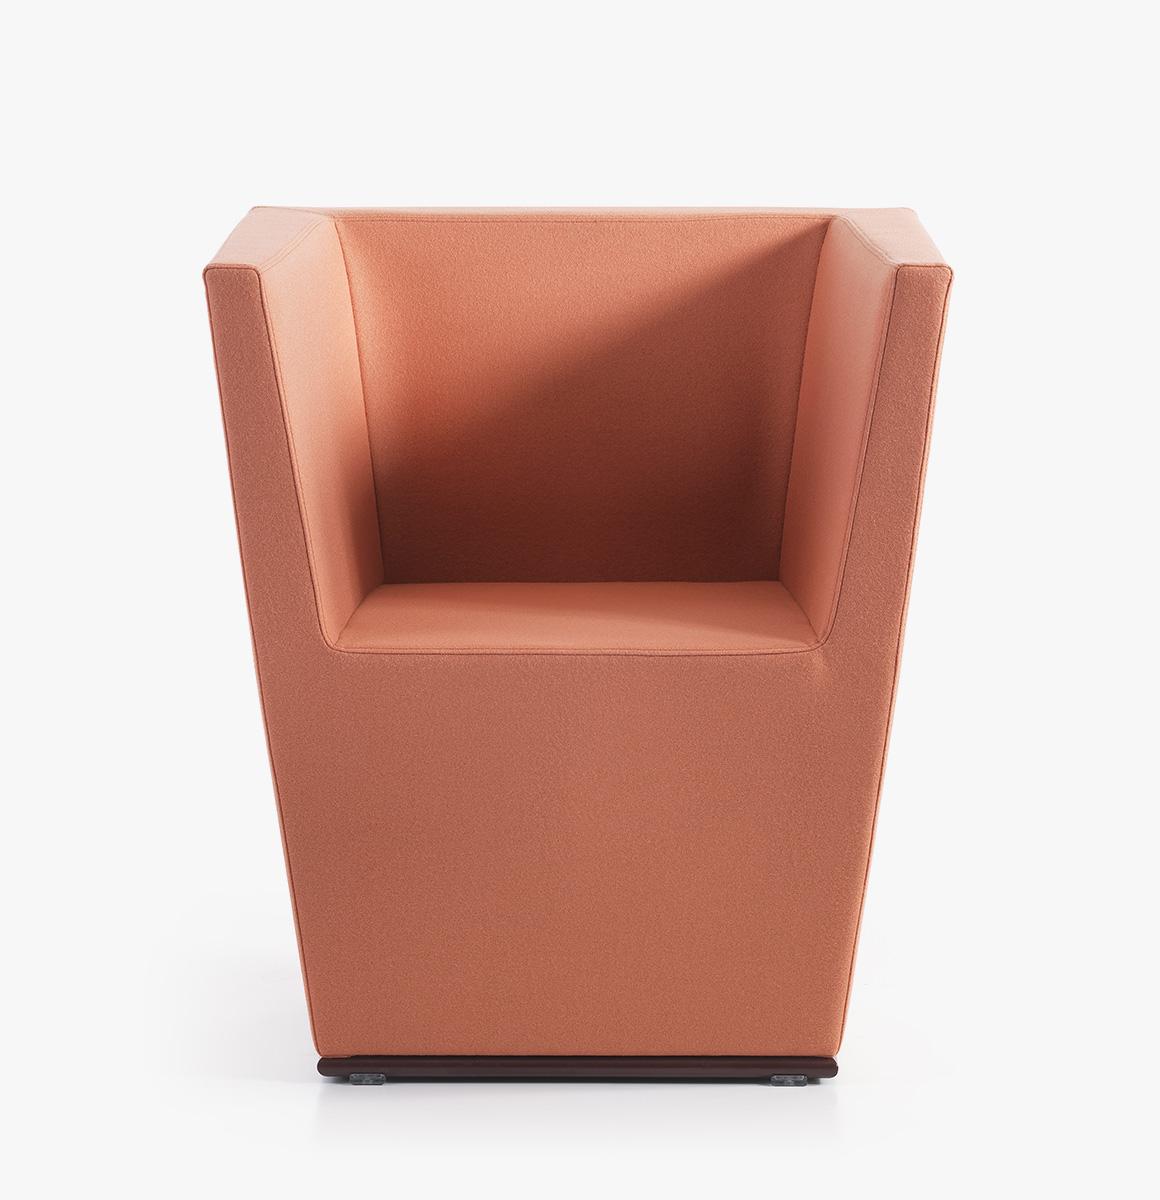 Area Modular Seating